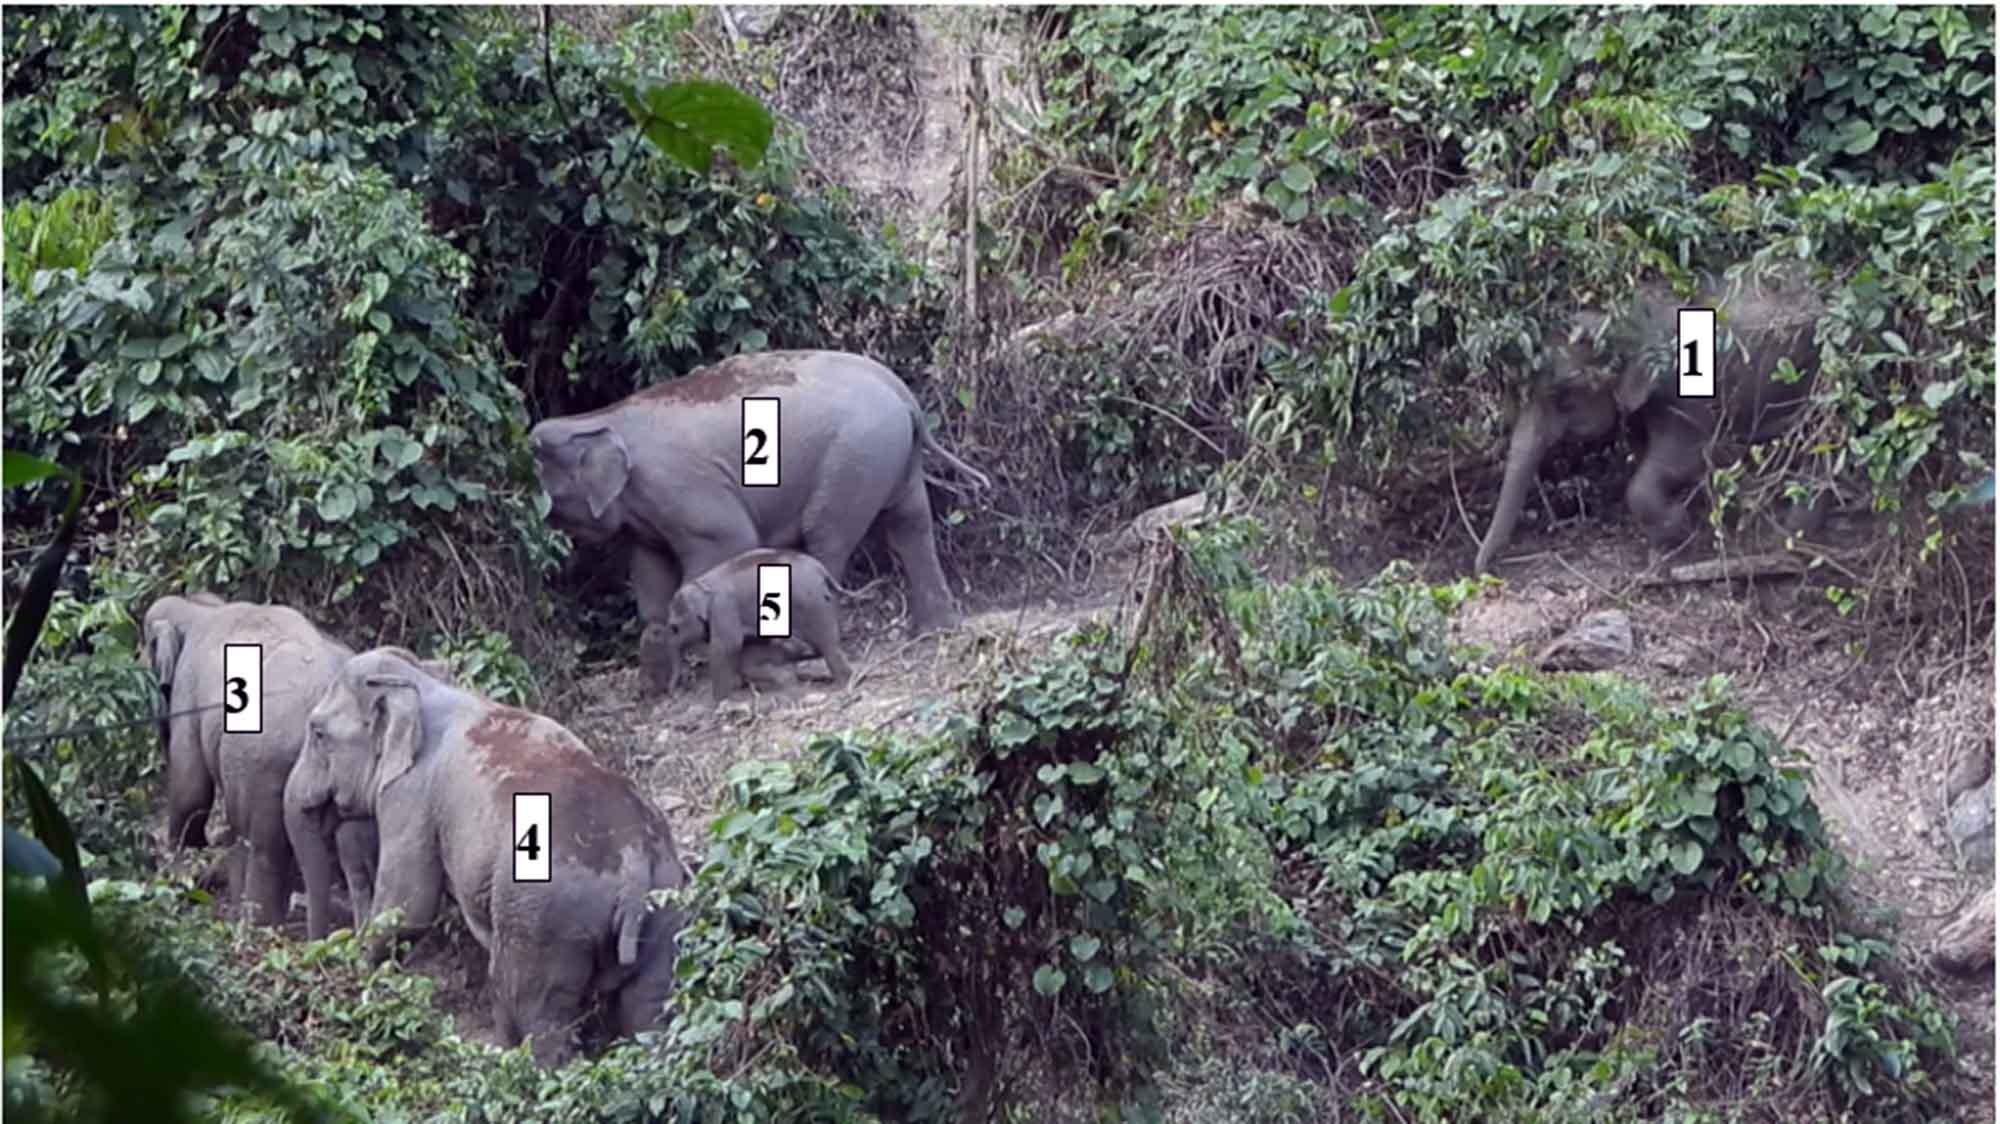 Wild elephants thrive in central Vietnam's sanctuary